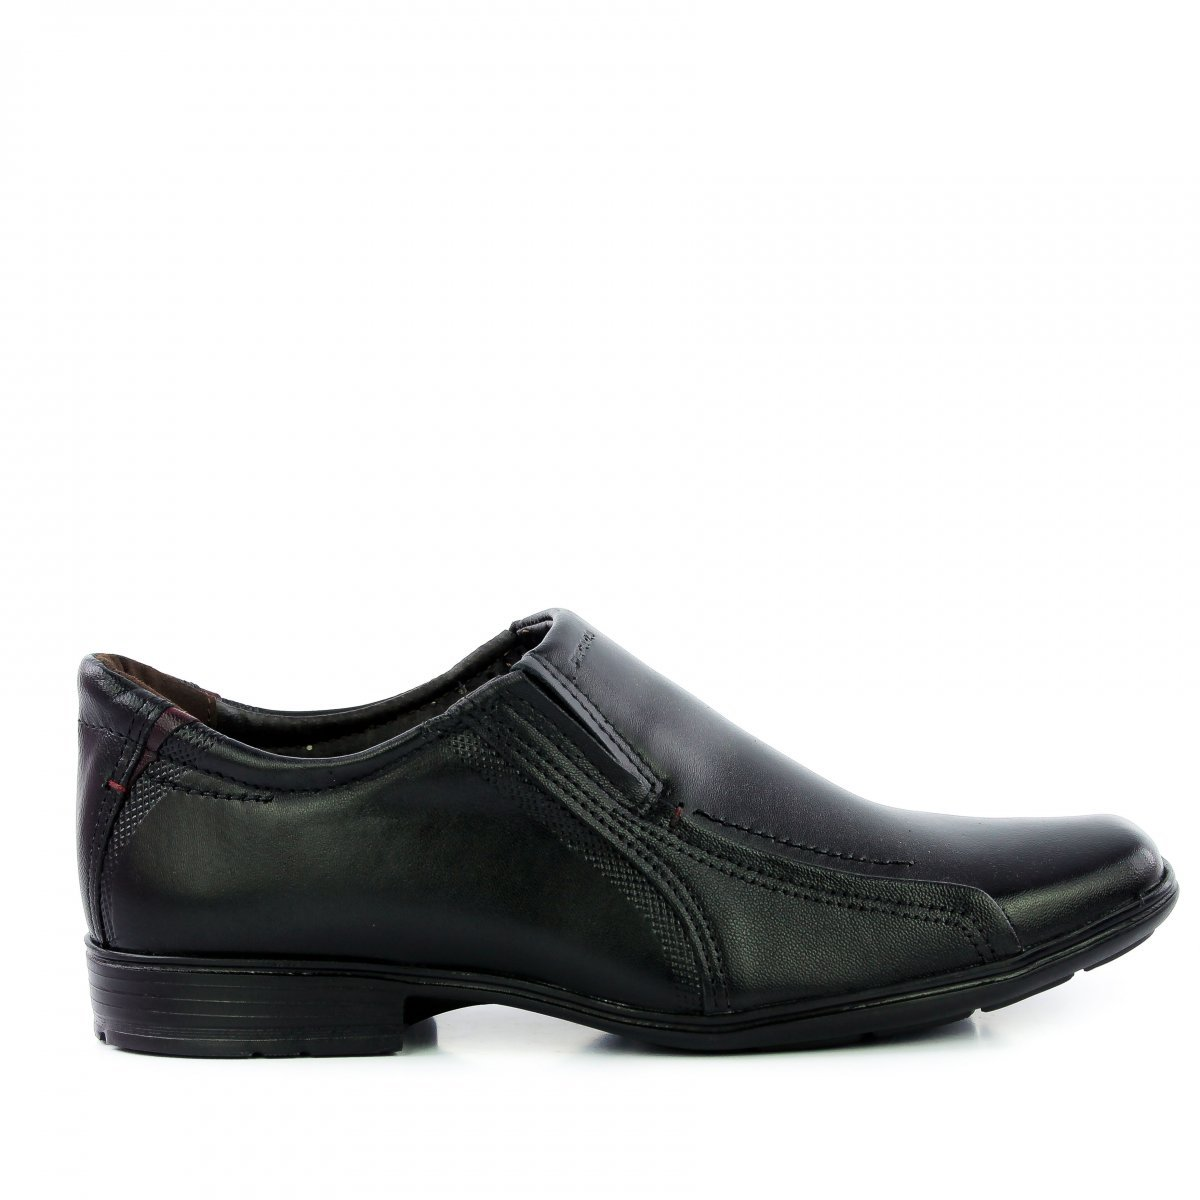 Pegada Pegada Sapato Preto Pegada Sapato Pegada Preto Preto Preto Sapato Sapato pwnY1xS